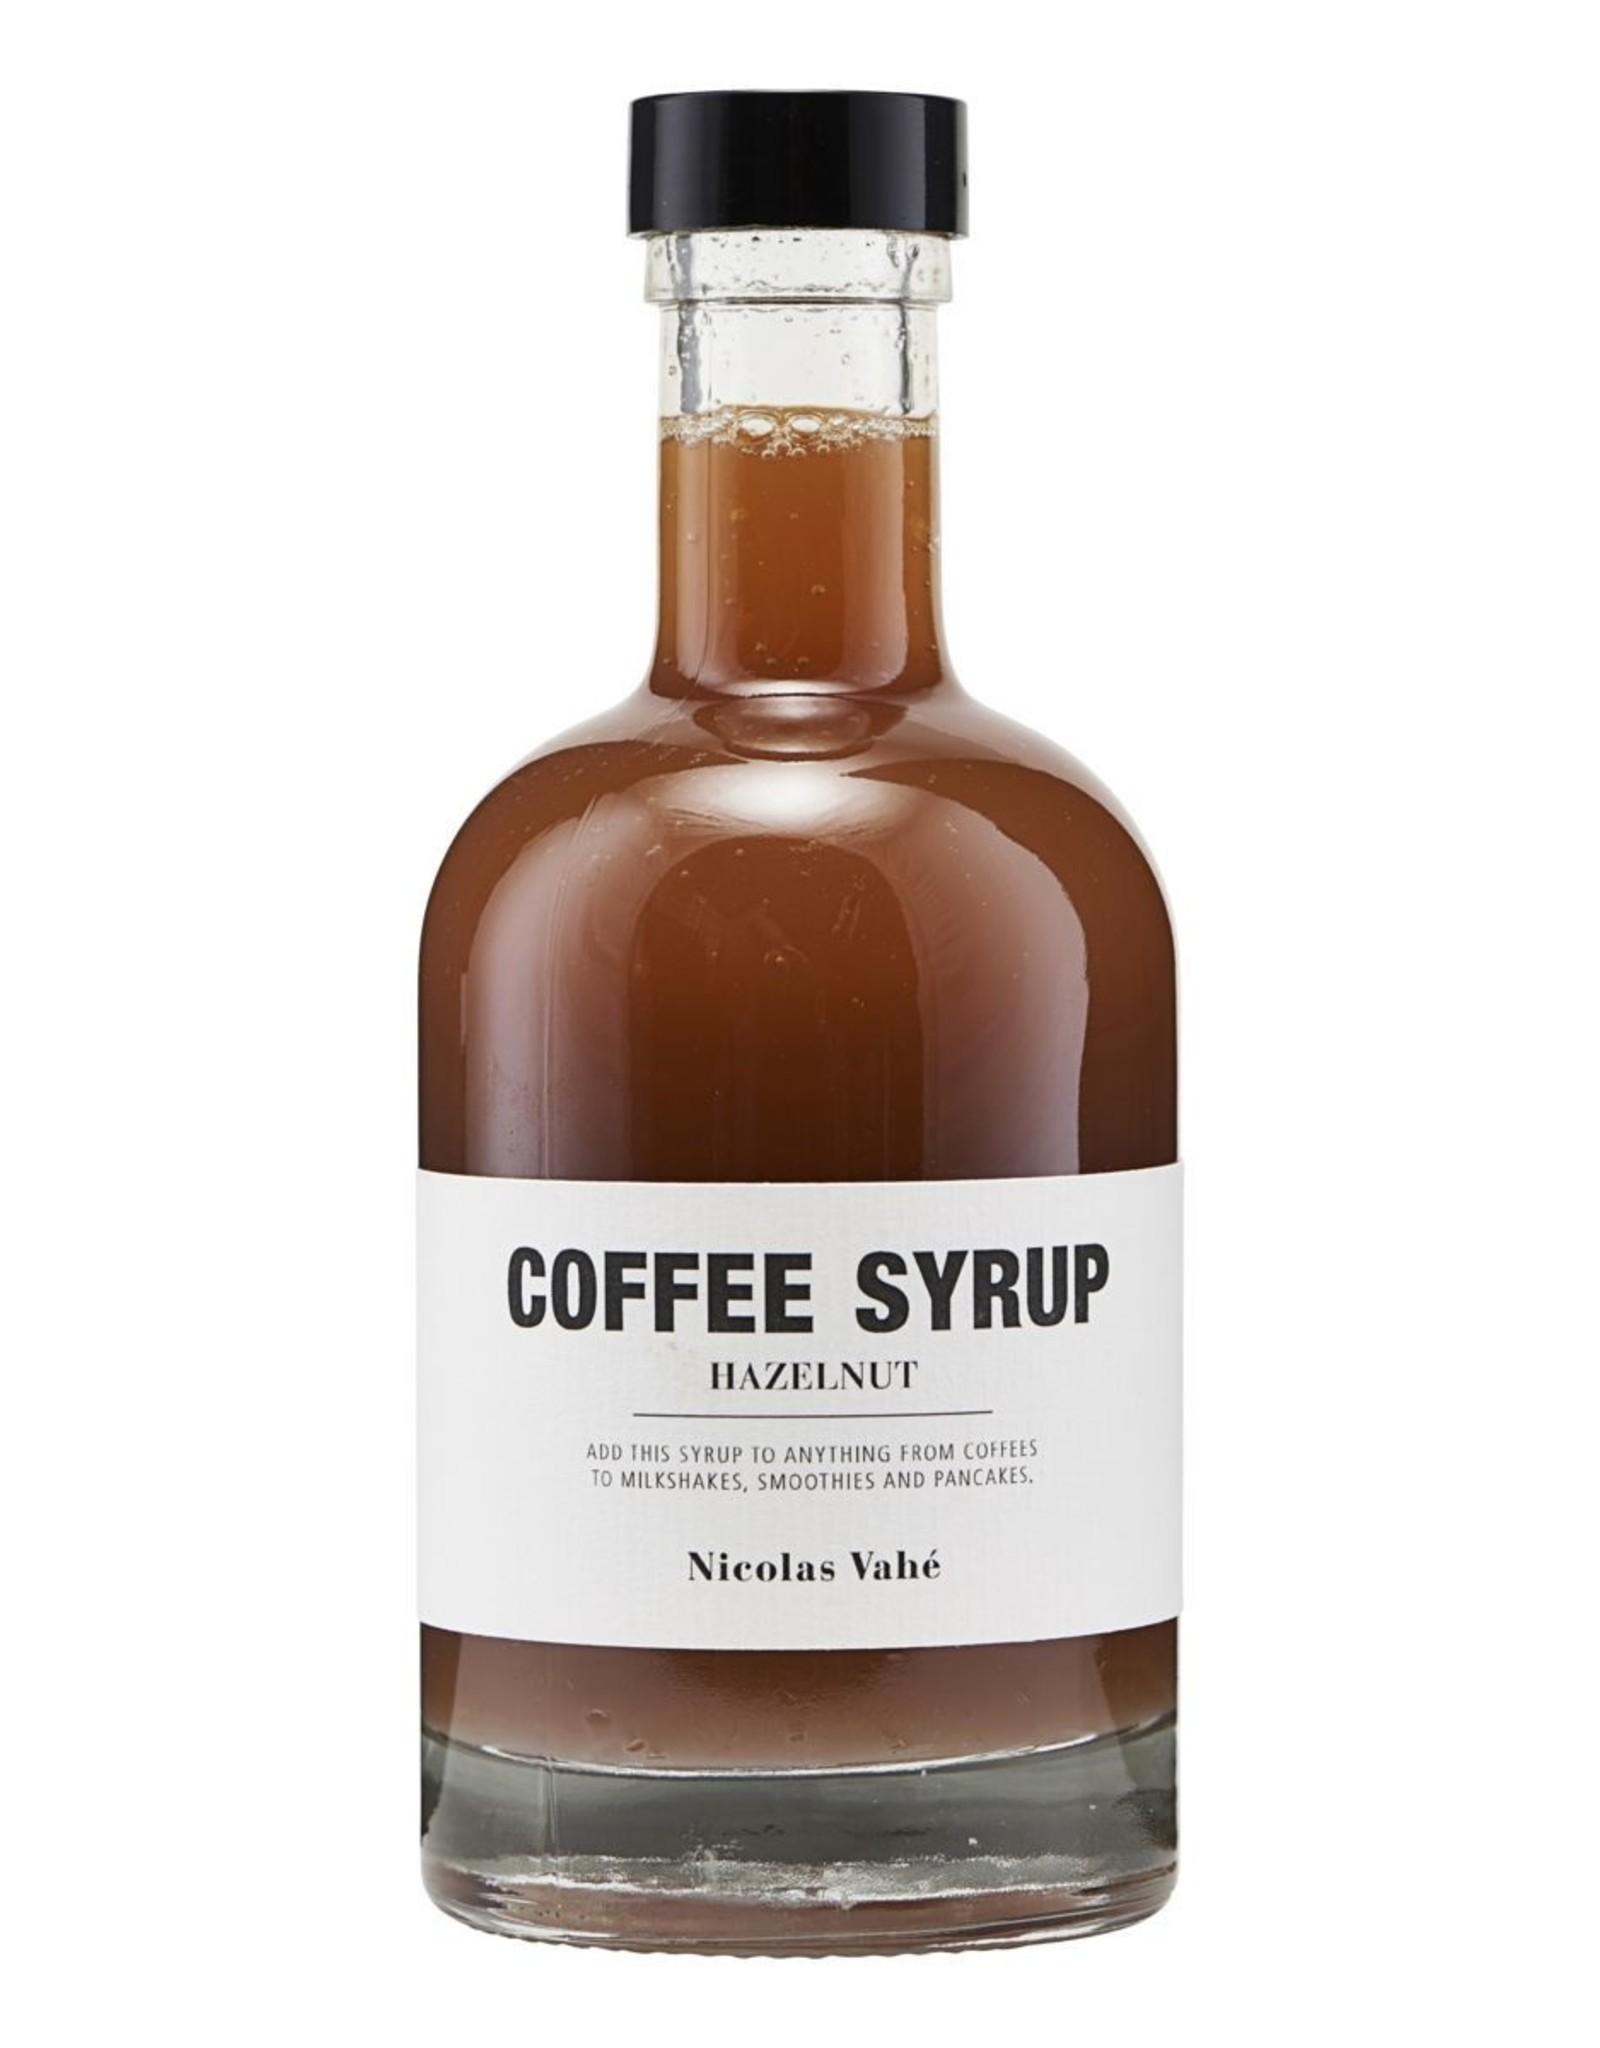 Nicolas Vahé Nicolas Vahé Syrup Hazelnut